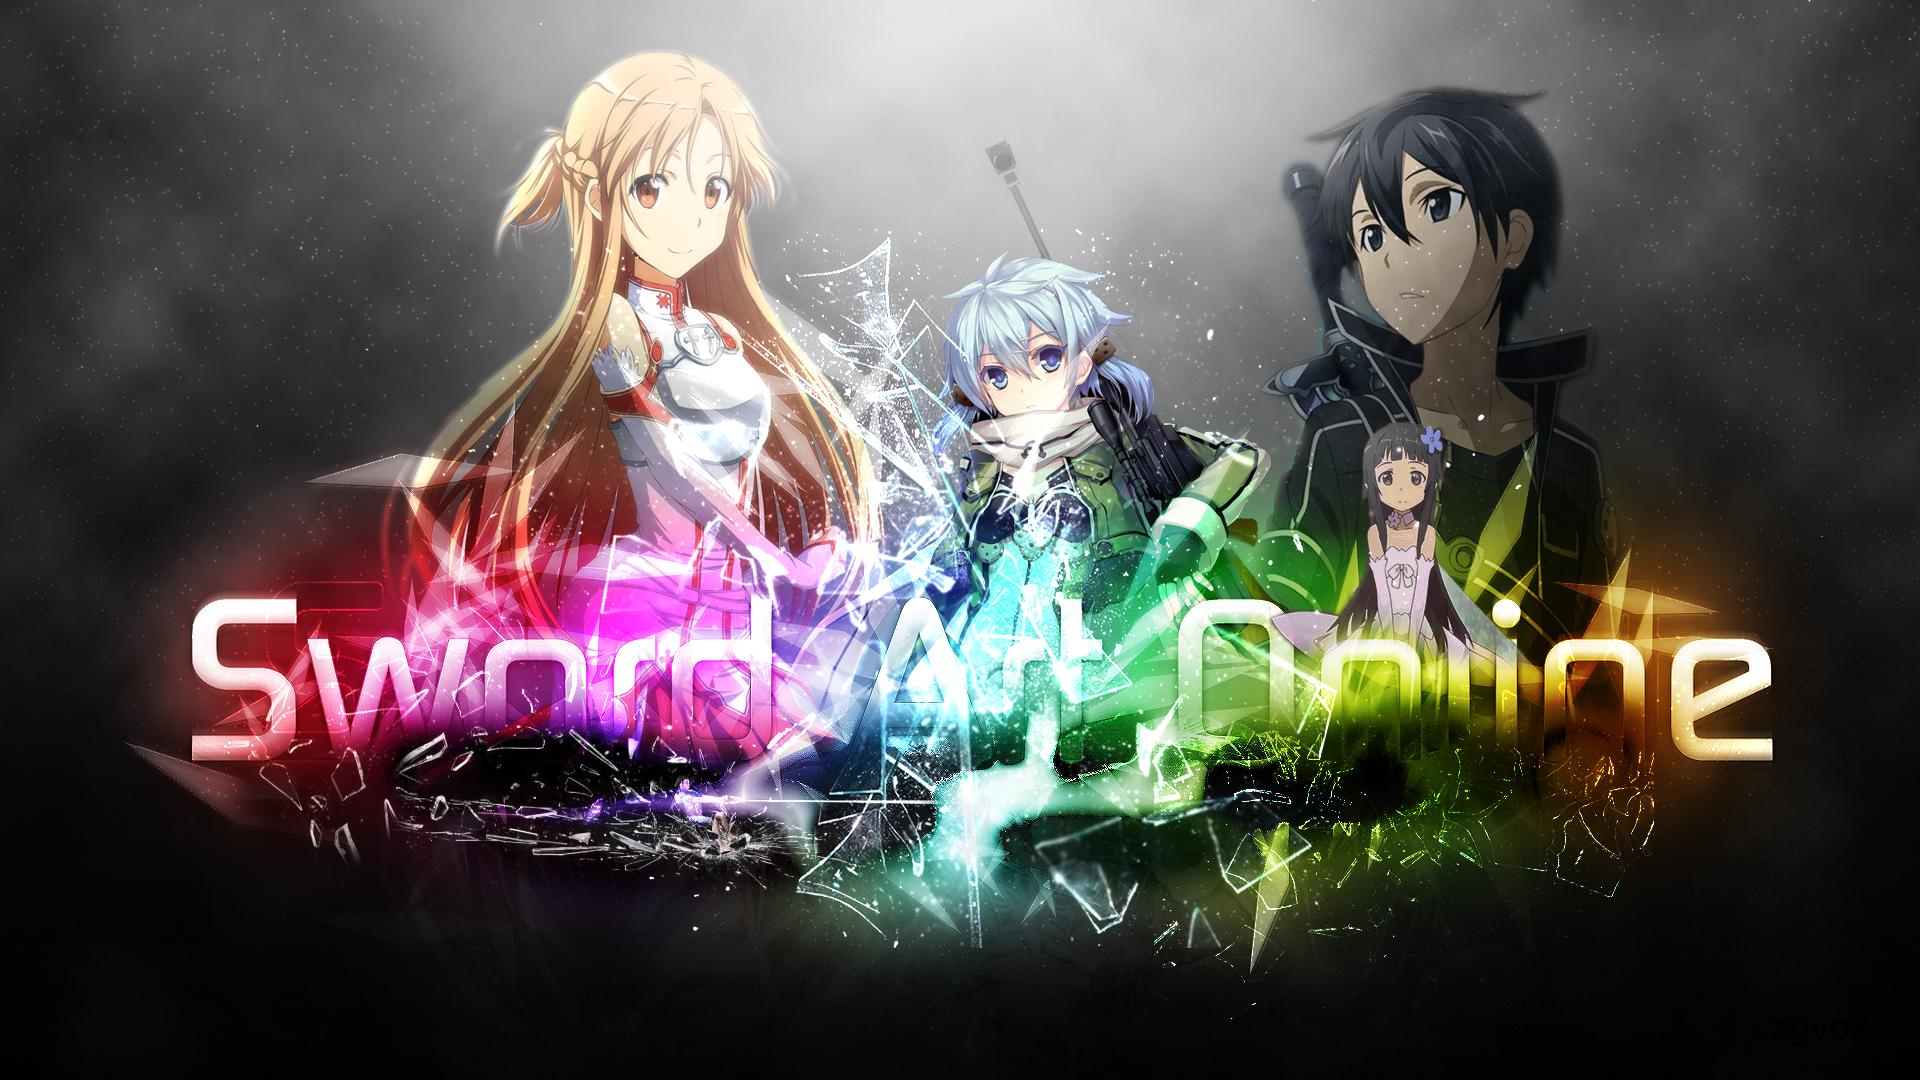 HD Wallpaper Background ID533007. 1920x1080 Anime Sword